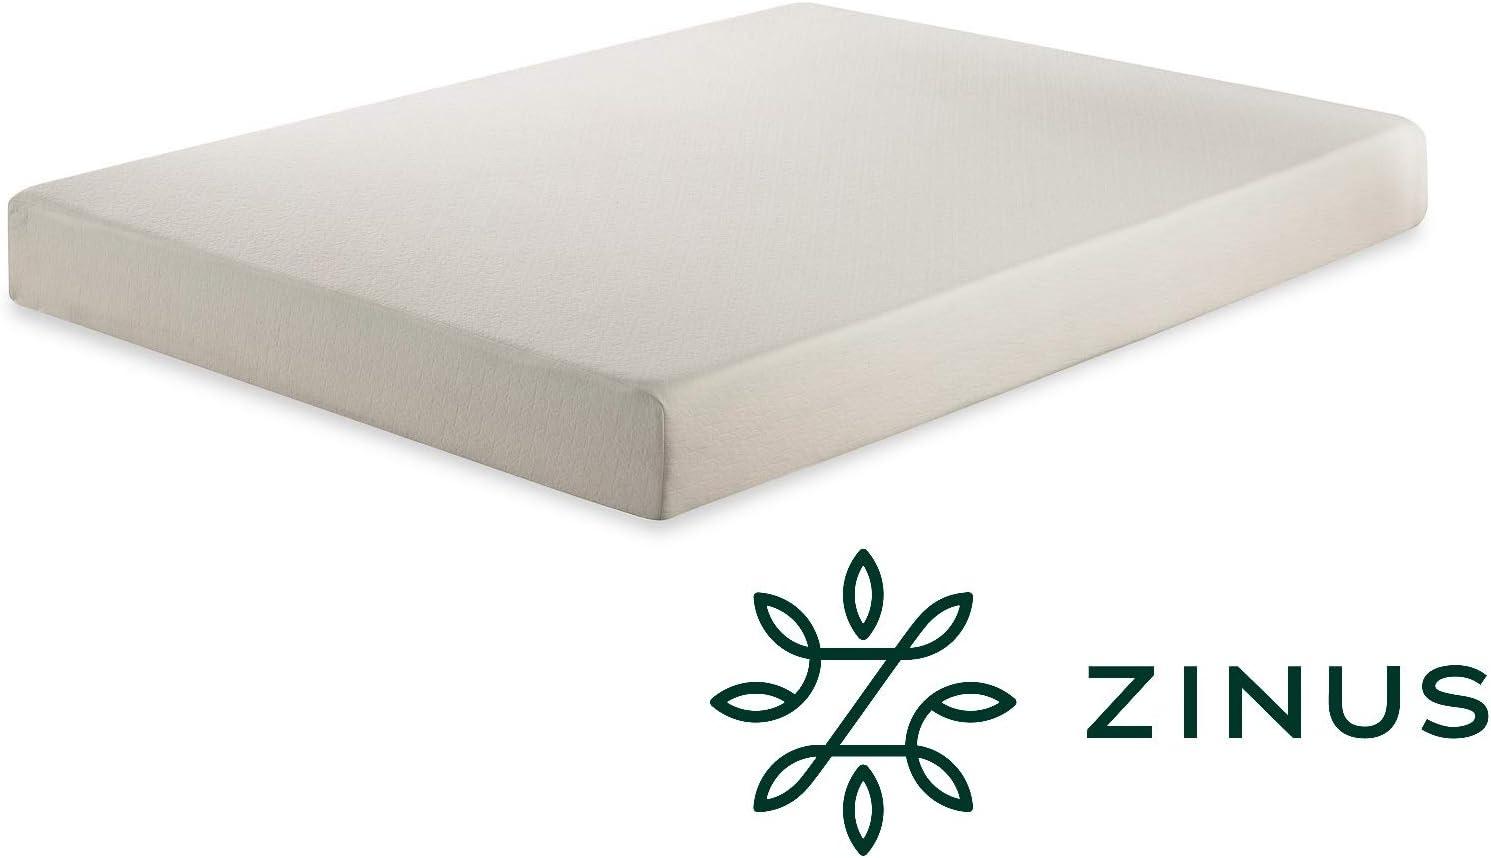 Zinus Materasso Singolo in Memory Foam 80x190x25cm Certificato Oeko-Tex